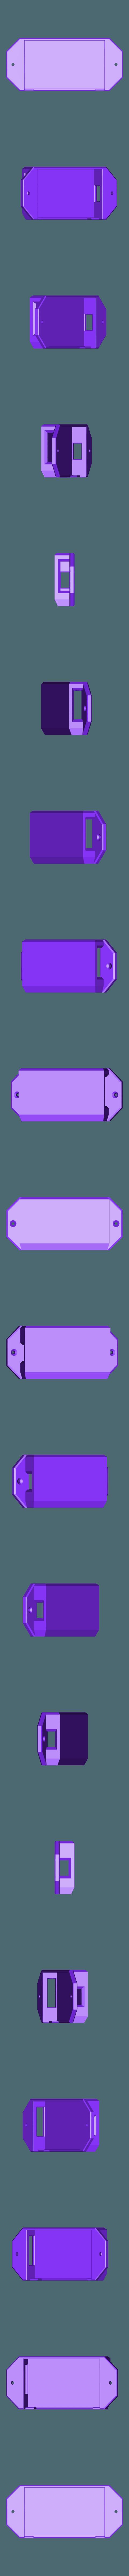 USB_Hub_Housing.stl Download STL file USB Hub Housing • 3D printable object, metac